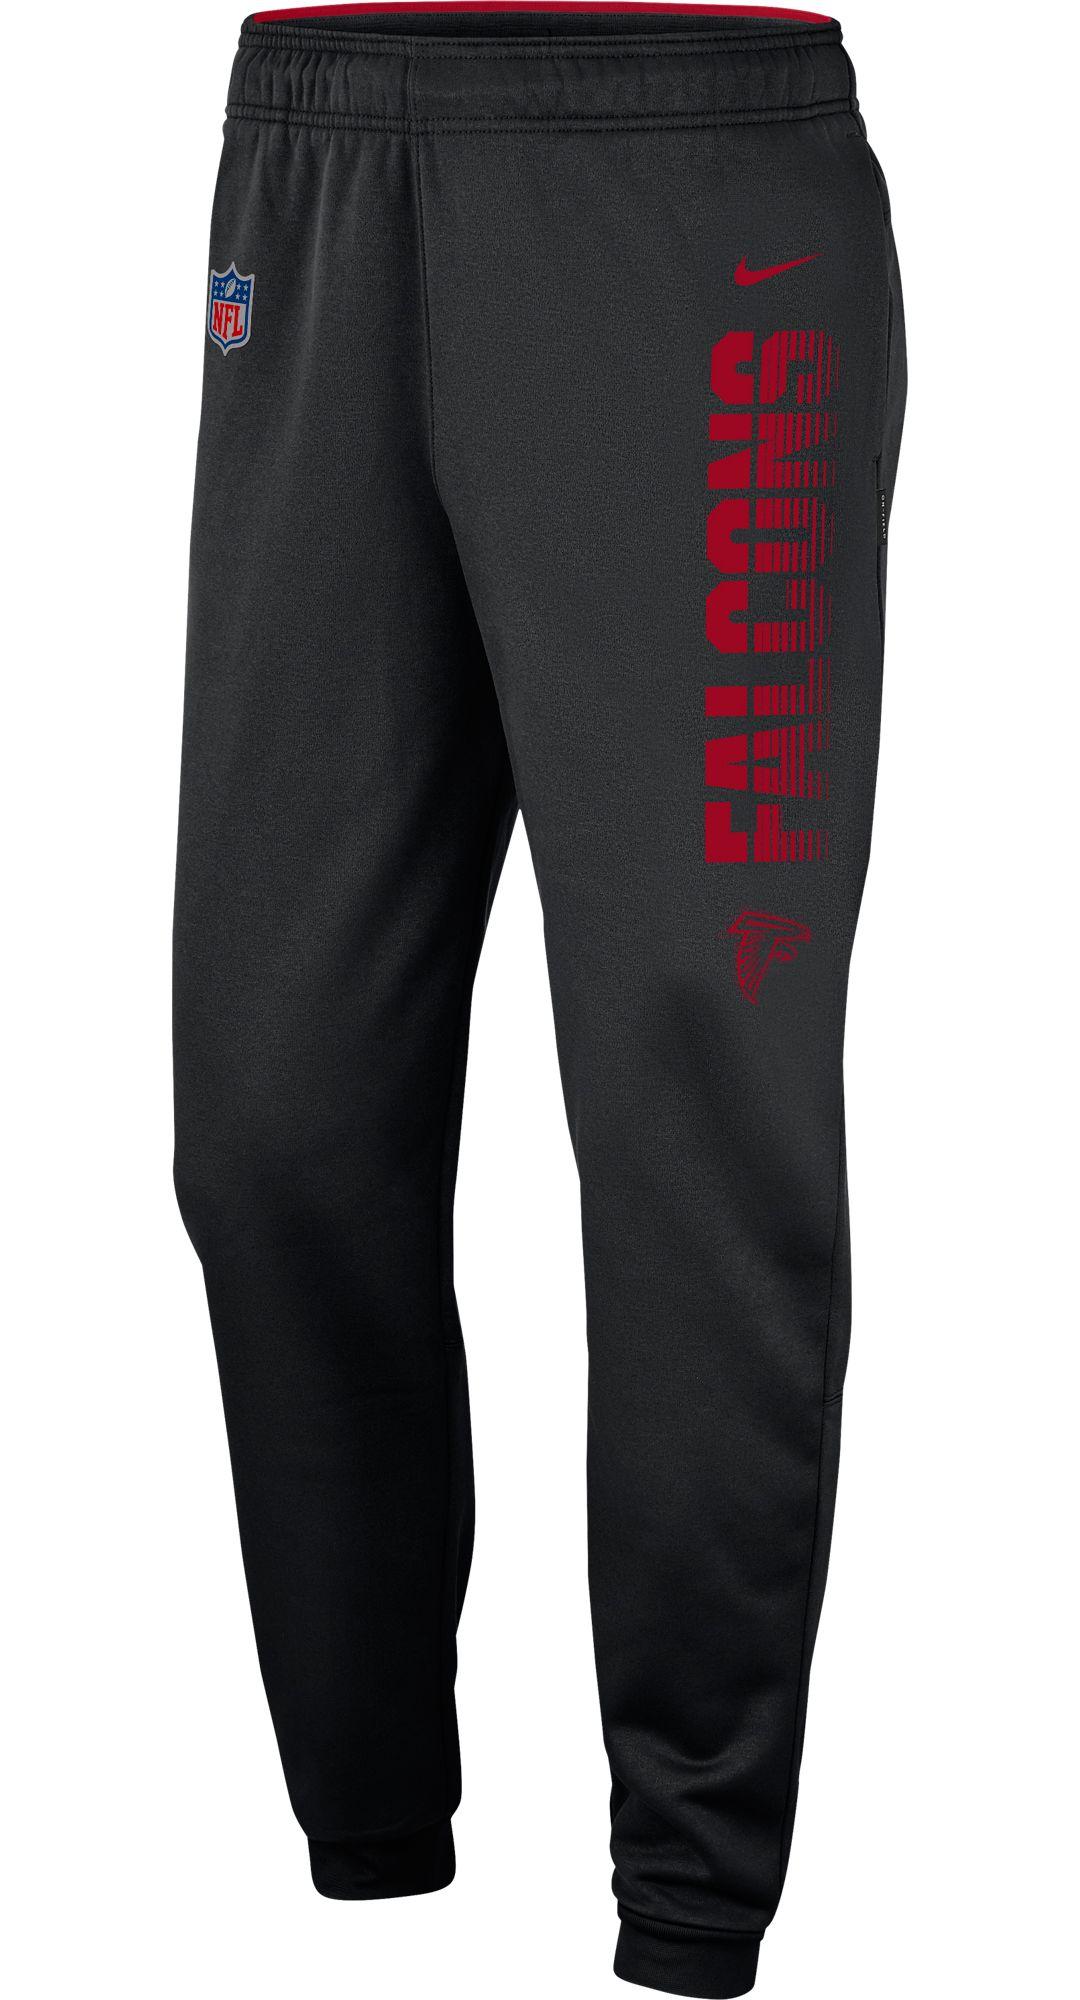 3cc012b9 Nike Men's Atlanta Falcons Sideline Therma-FIT Performance Black Pants